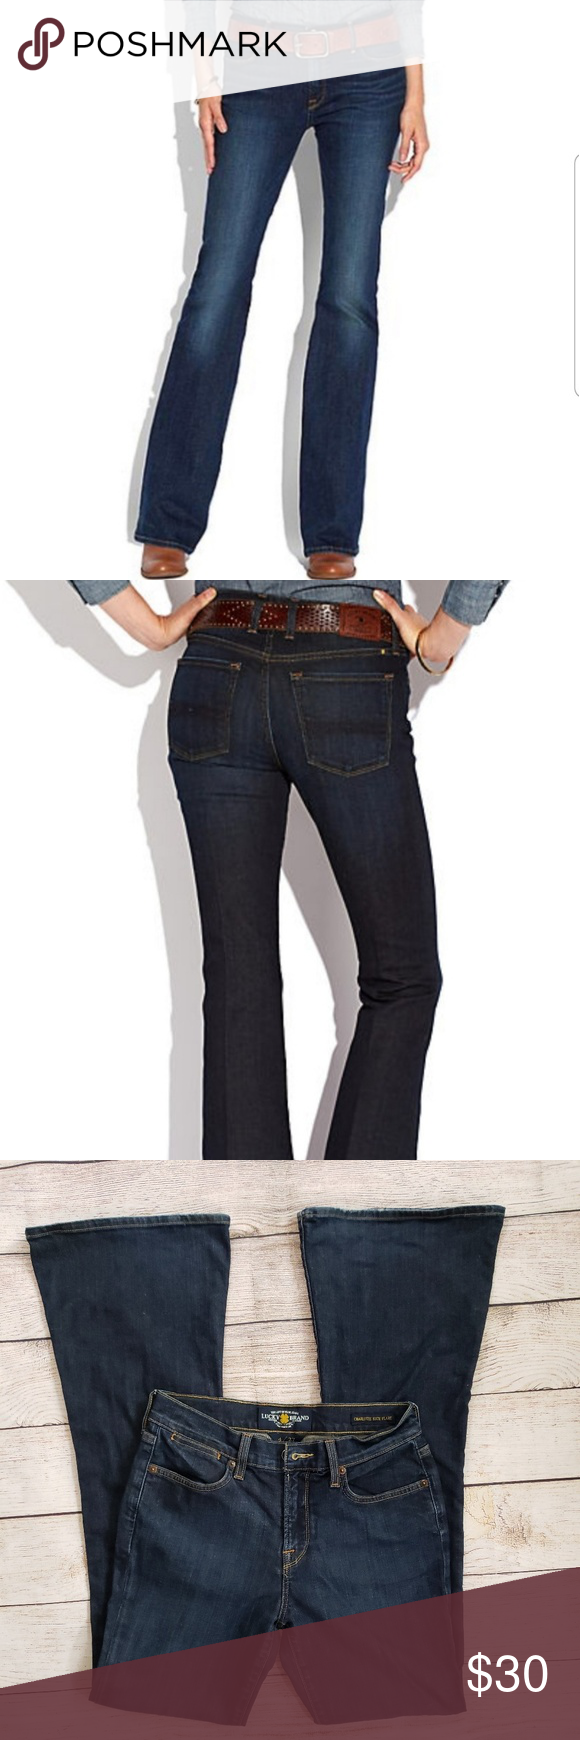 Lucky Brand Jeans Womens Charlotte Kick Flare Denim Jeans